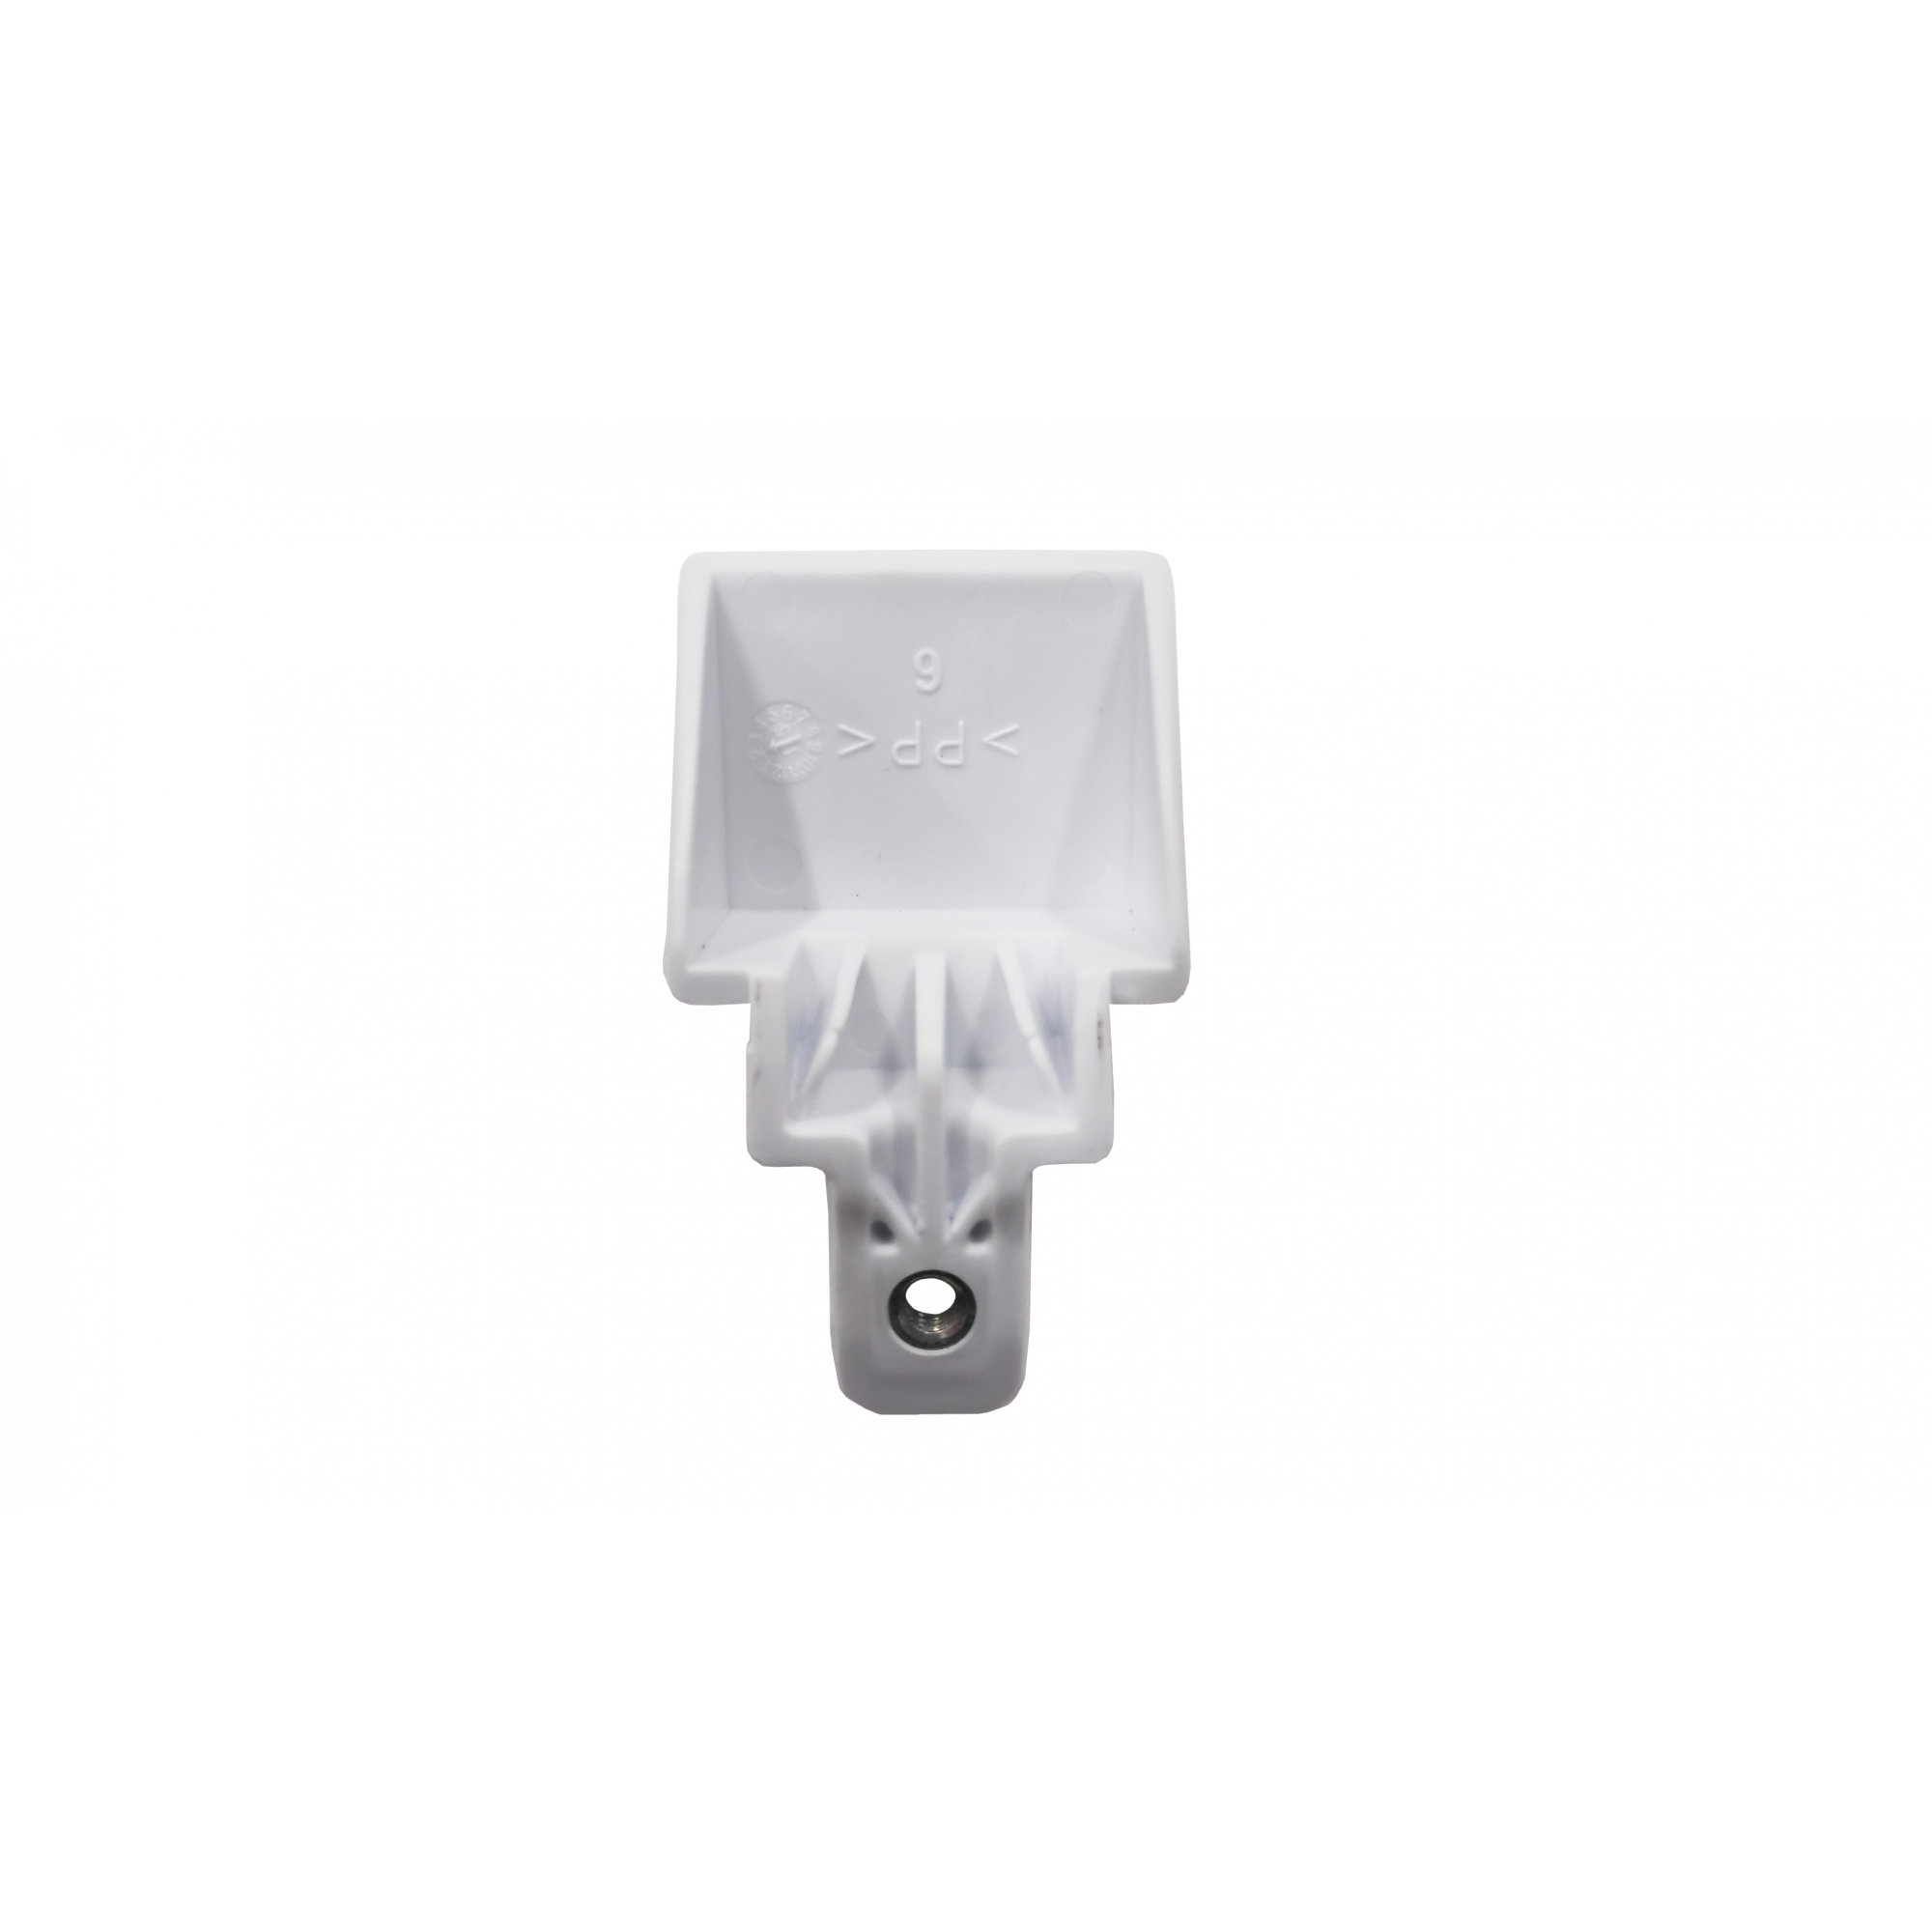 SUPORTE PUXADOR INFERIOR REFRIGERADOR ELECTROLUX 67401619